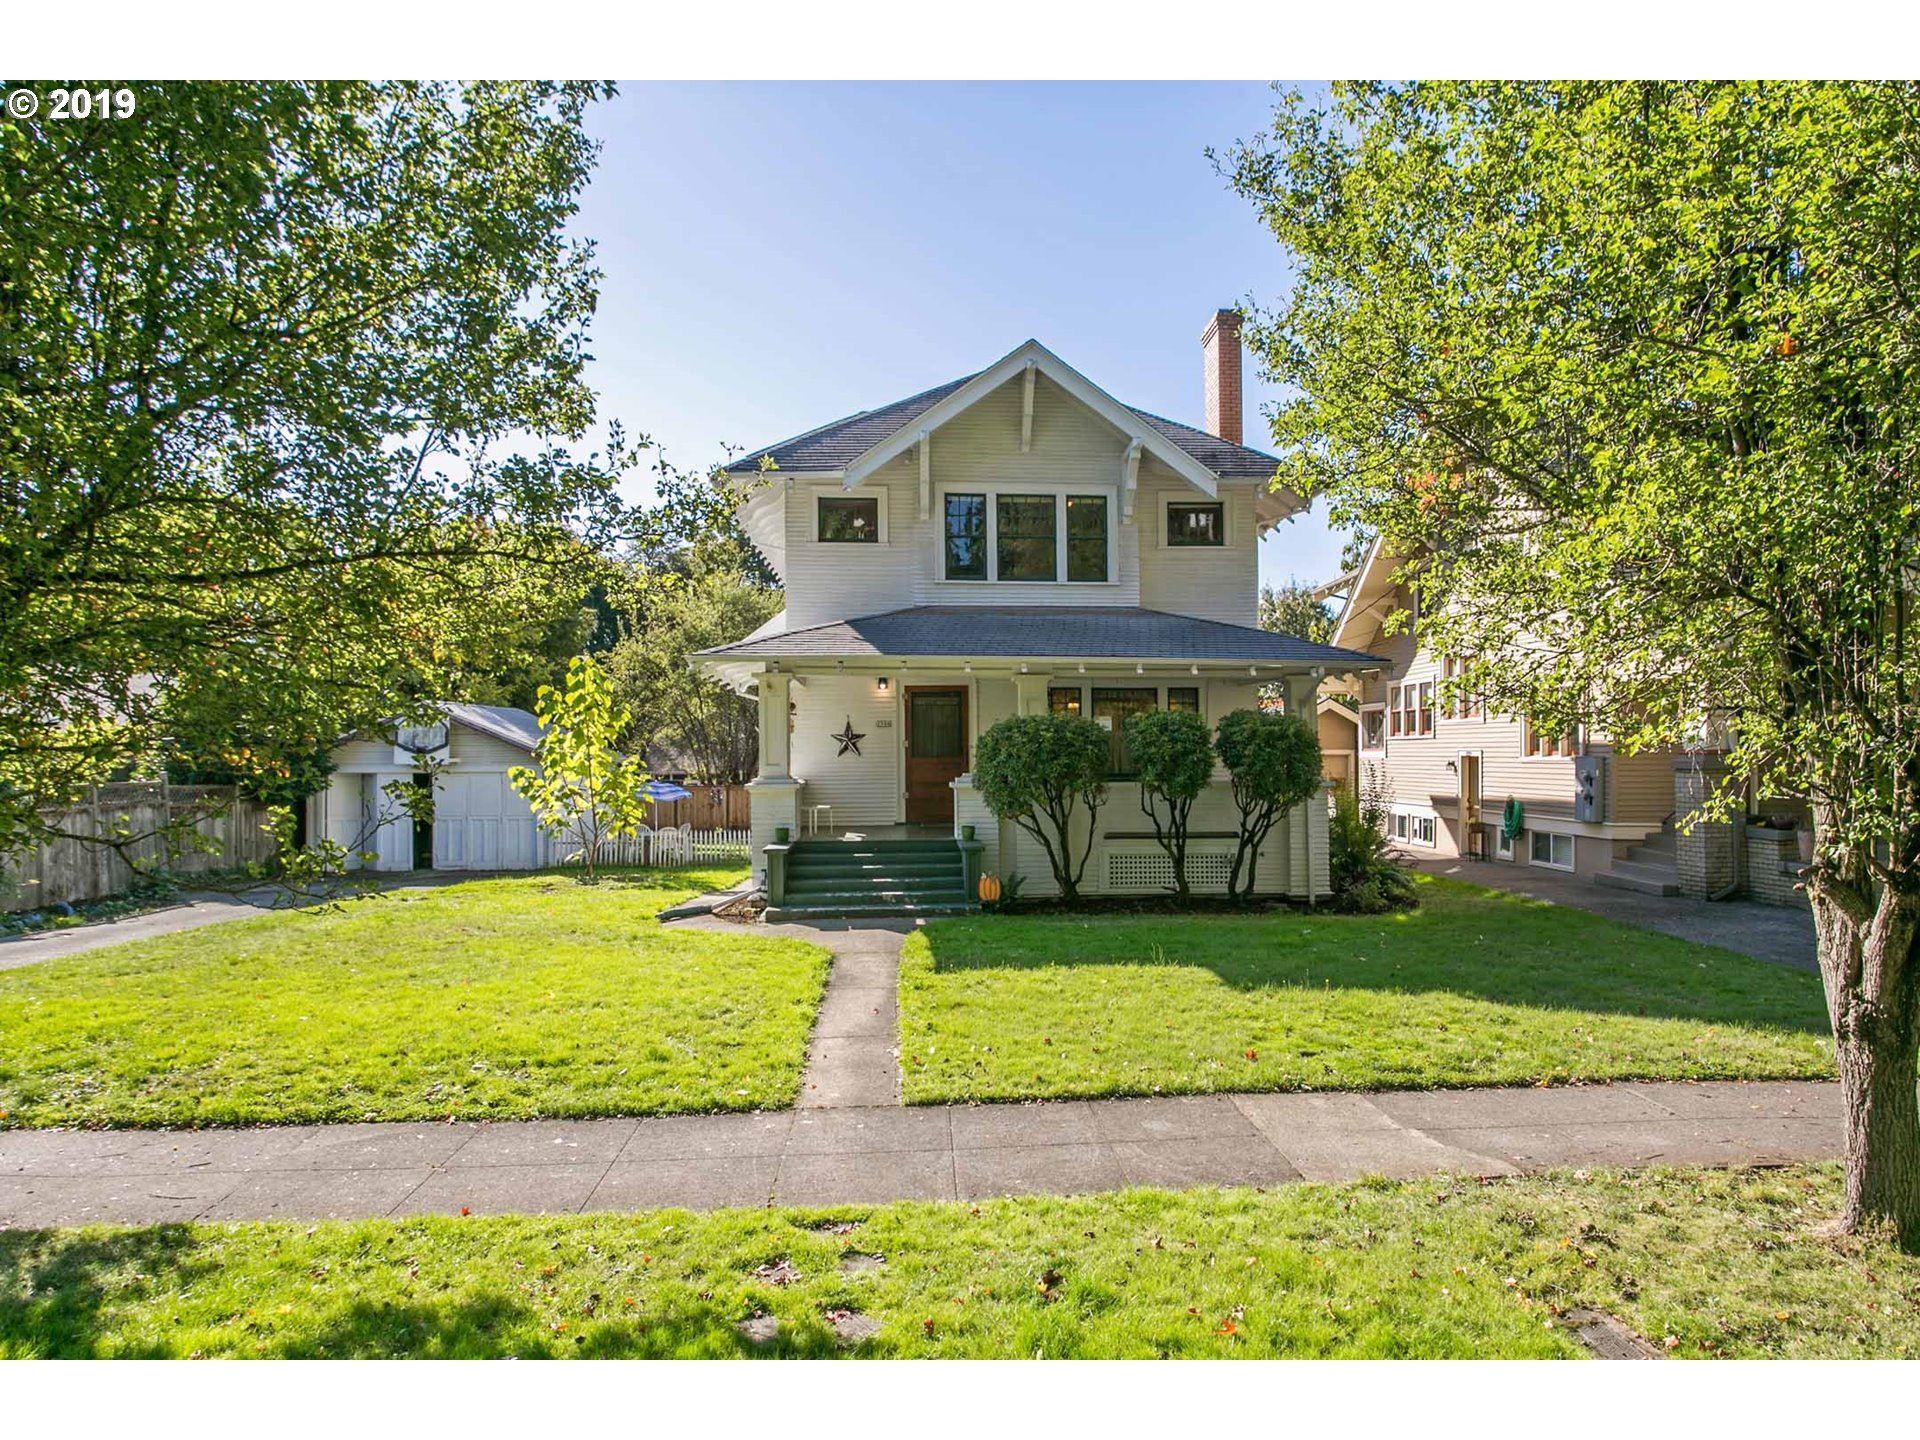 2506 SE GRANT ST, Portland, OR 97214 - MLS#: 20417716